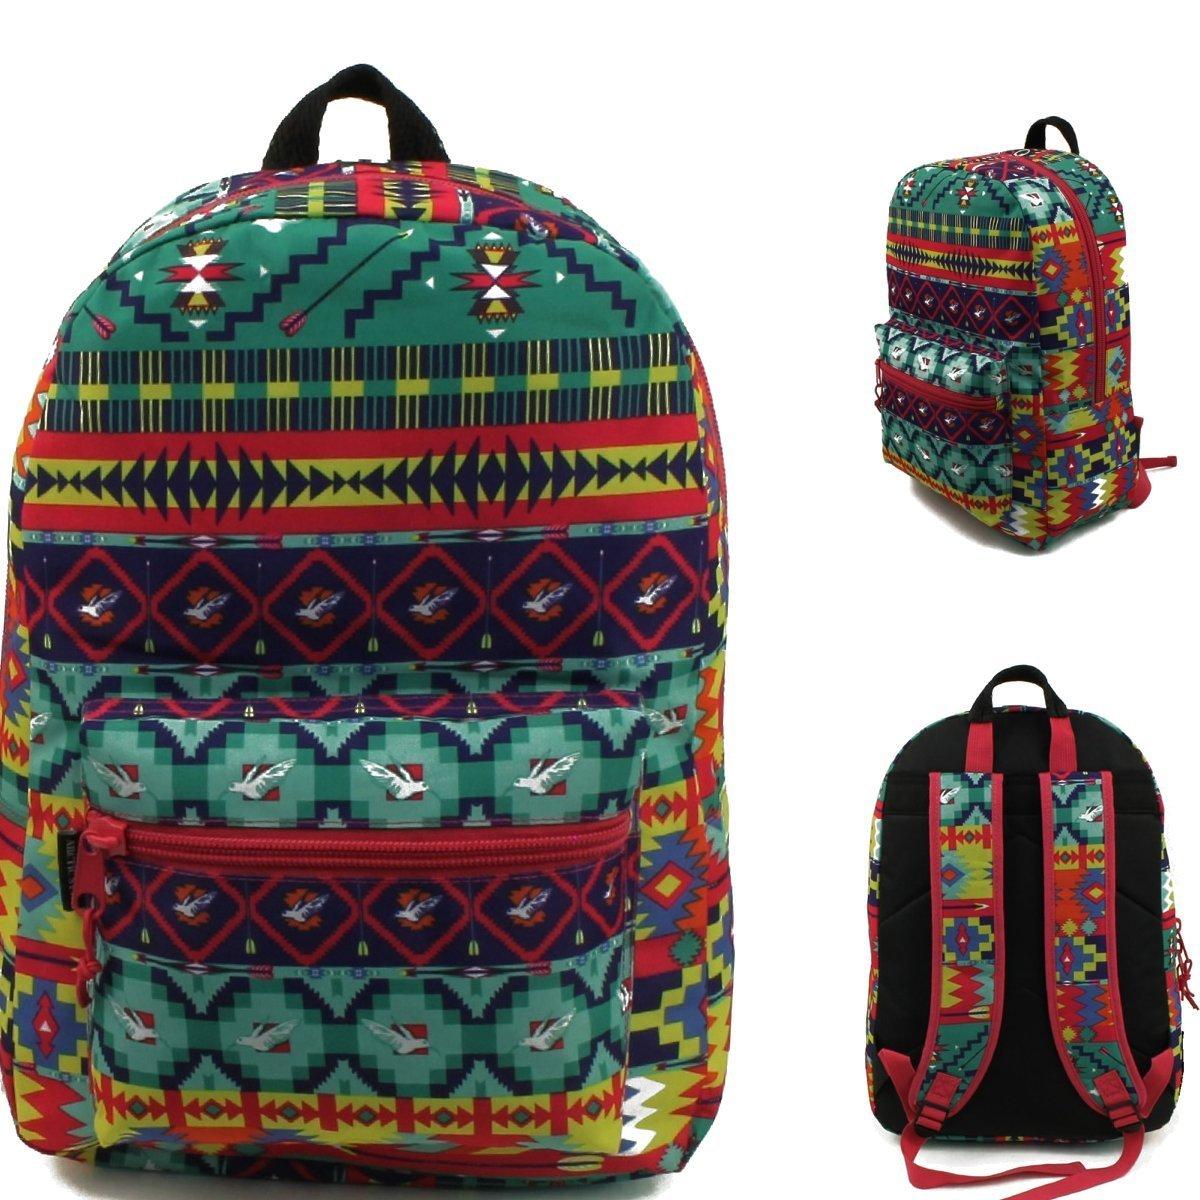 17'' Wholesale Padded Fashion Backpack - Case of 24